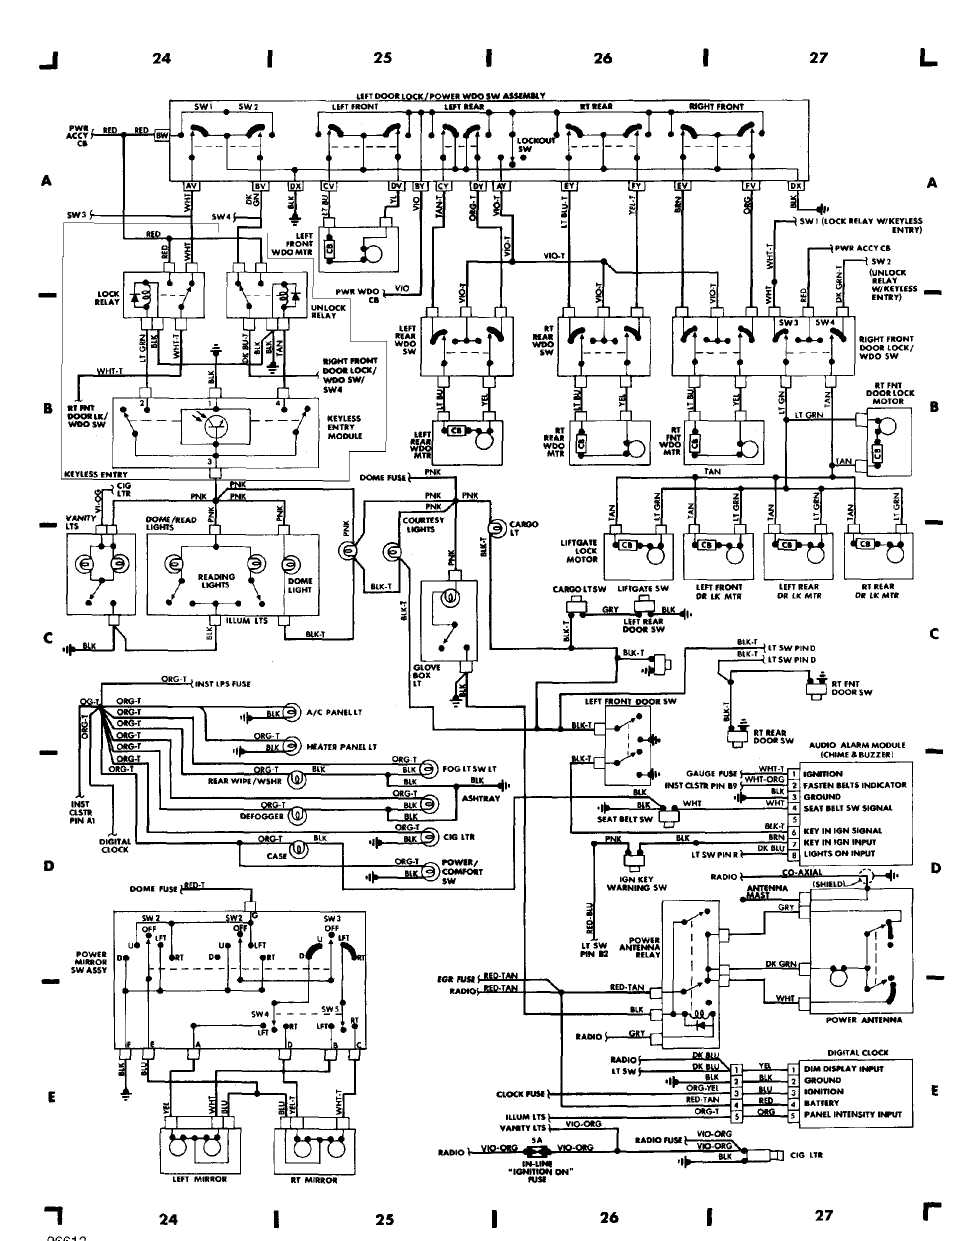 DIAGRAM] For A 1996 Jeep Wiring Diagram FULL Version HD Quality Wiring  Diagram - AAWIRINGLOOM.MAMI-WATA.FRMami Wata